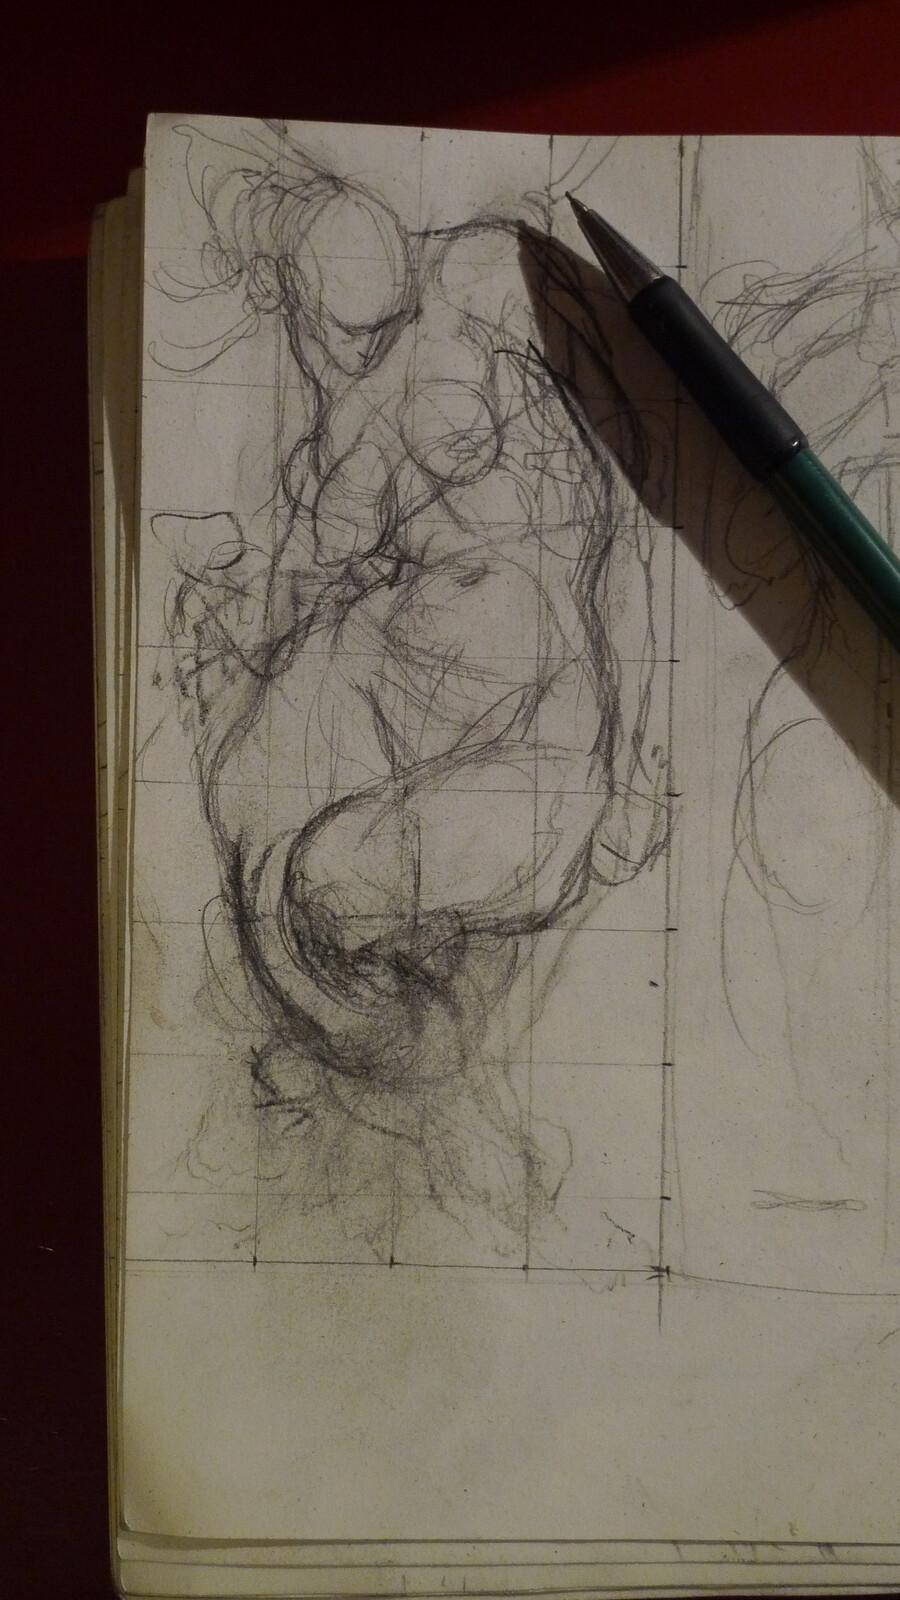 First little sketch